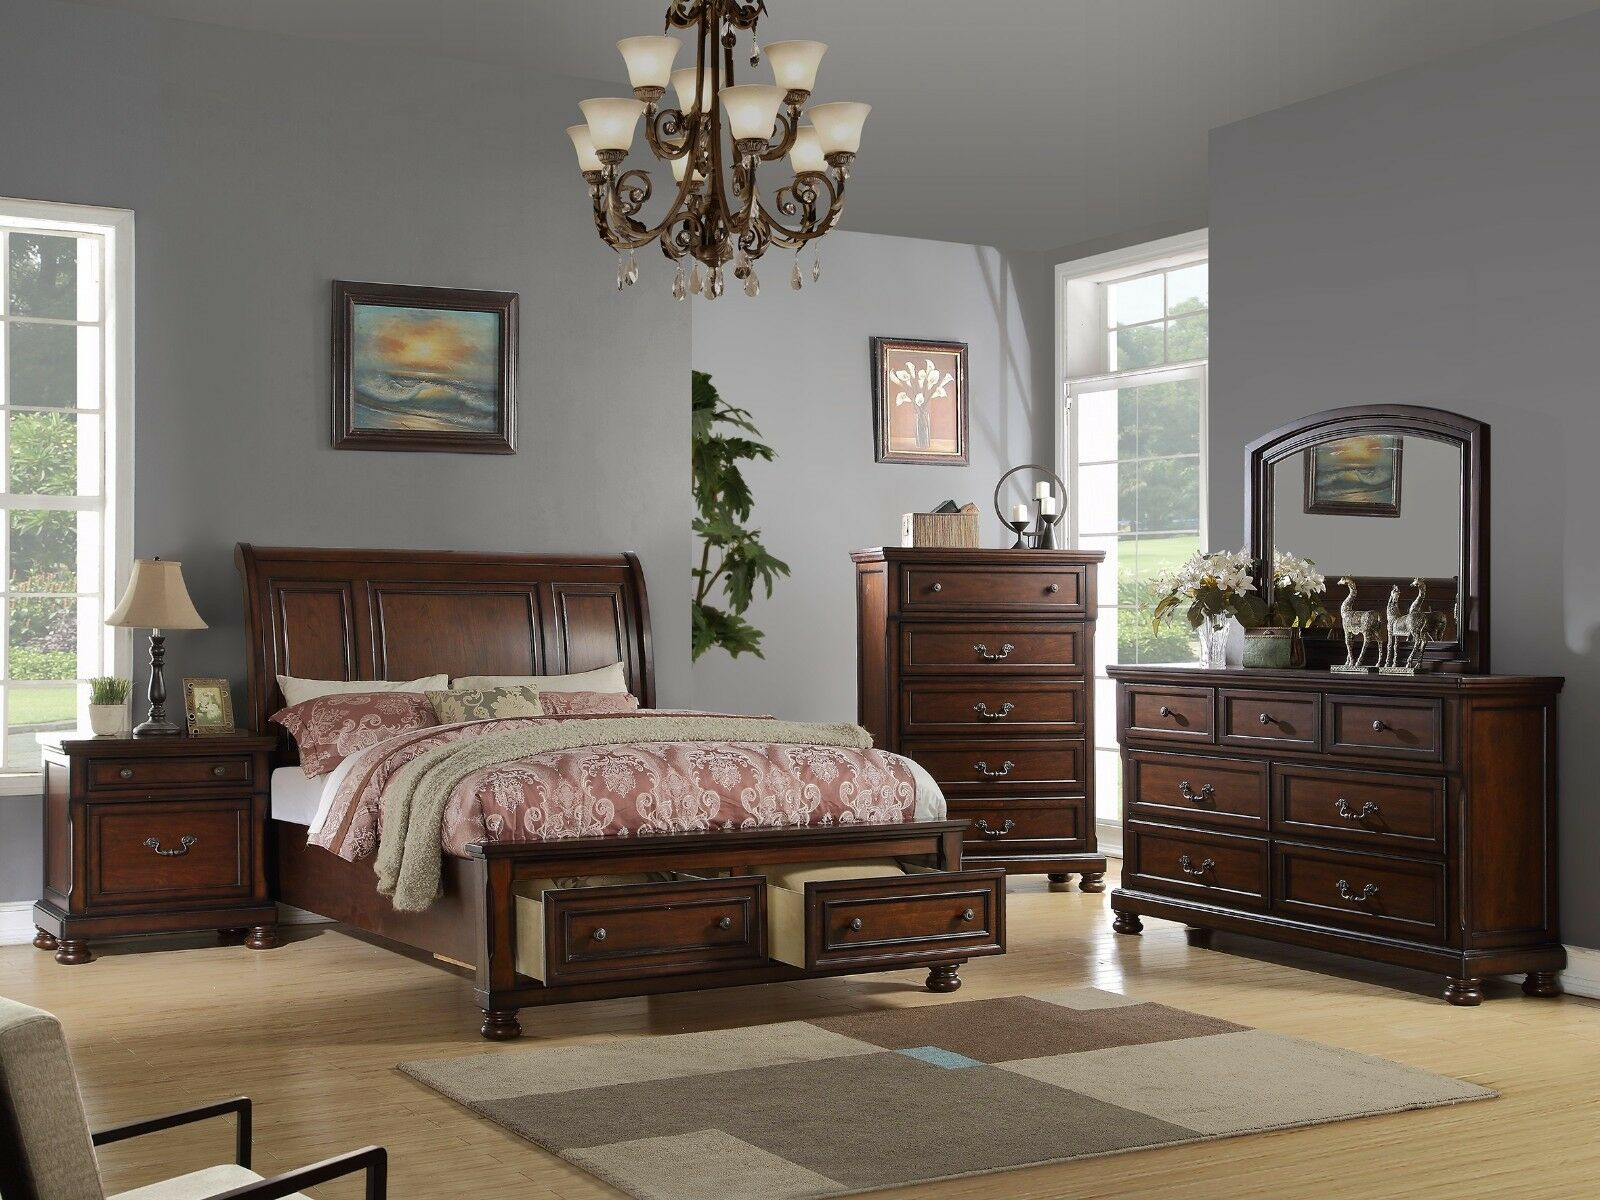 Modern 4p Espresso Finish Bedroom Est King Bed Mirror Dresser Nightstand Drawers For Sale Online Ebay